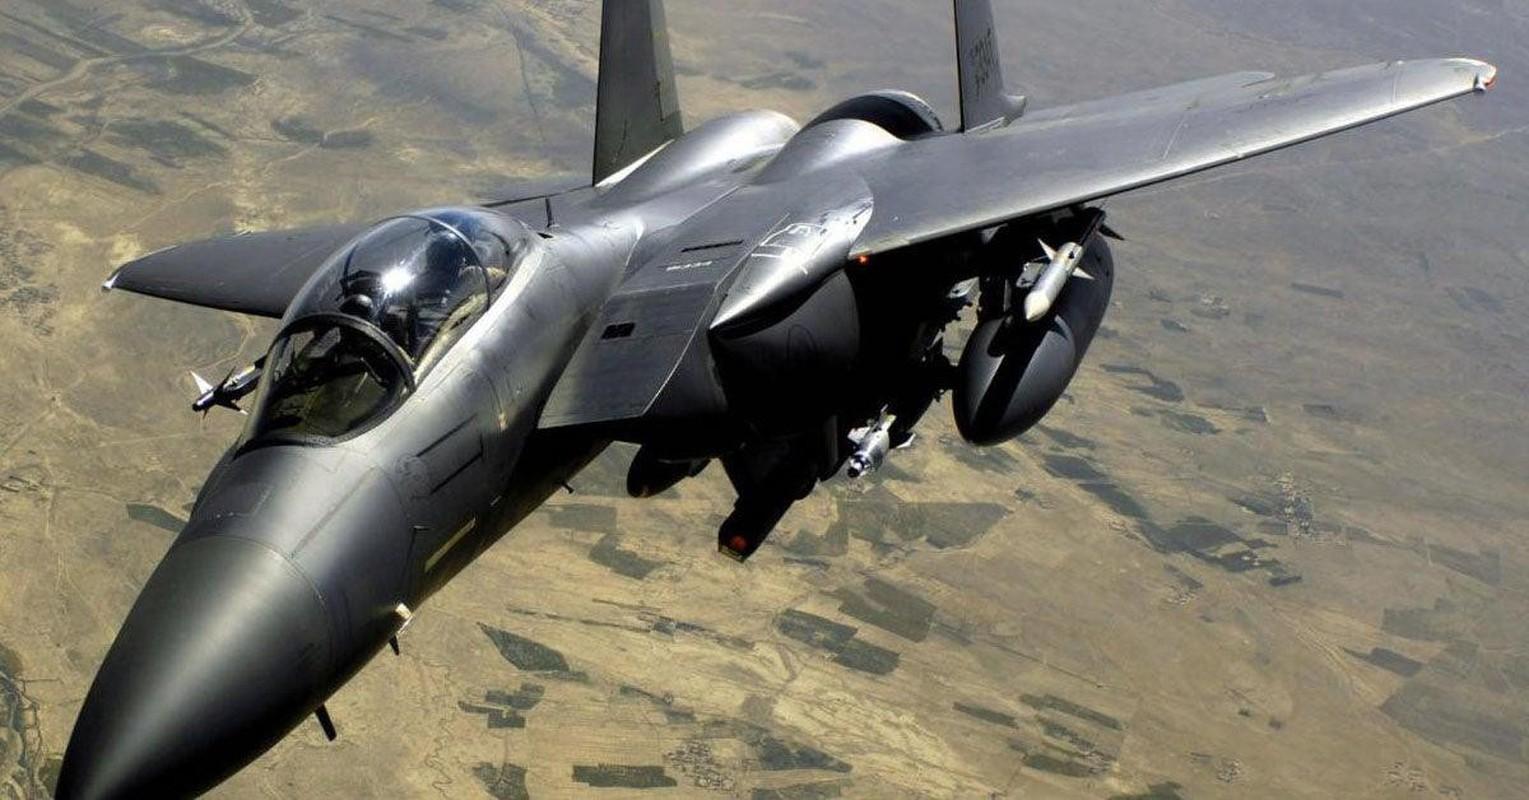 Tiem kich F-15E cua My manh ngang may bay nem bom chien luoc Trung Quoc-Hinh-19